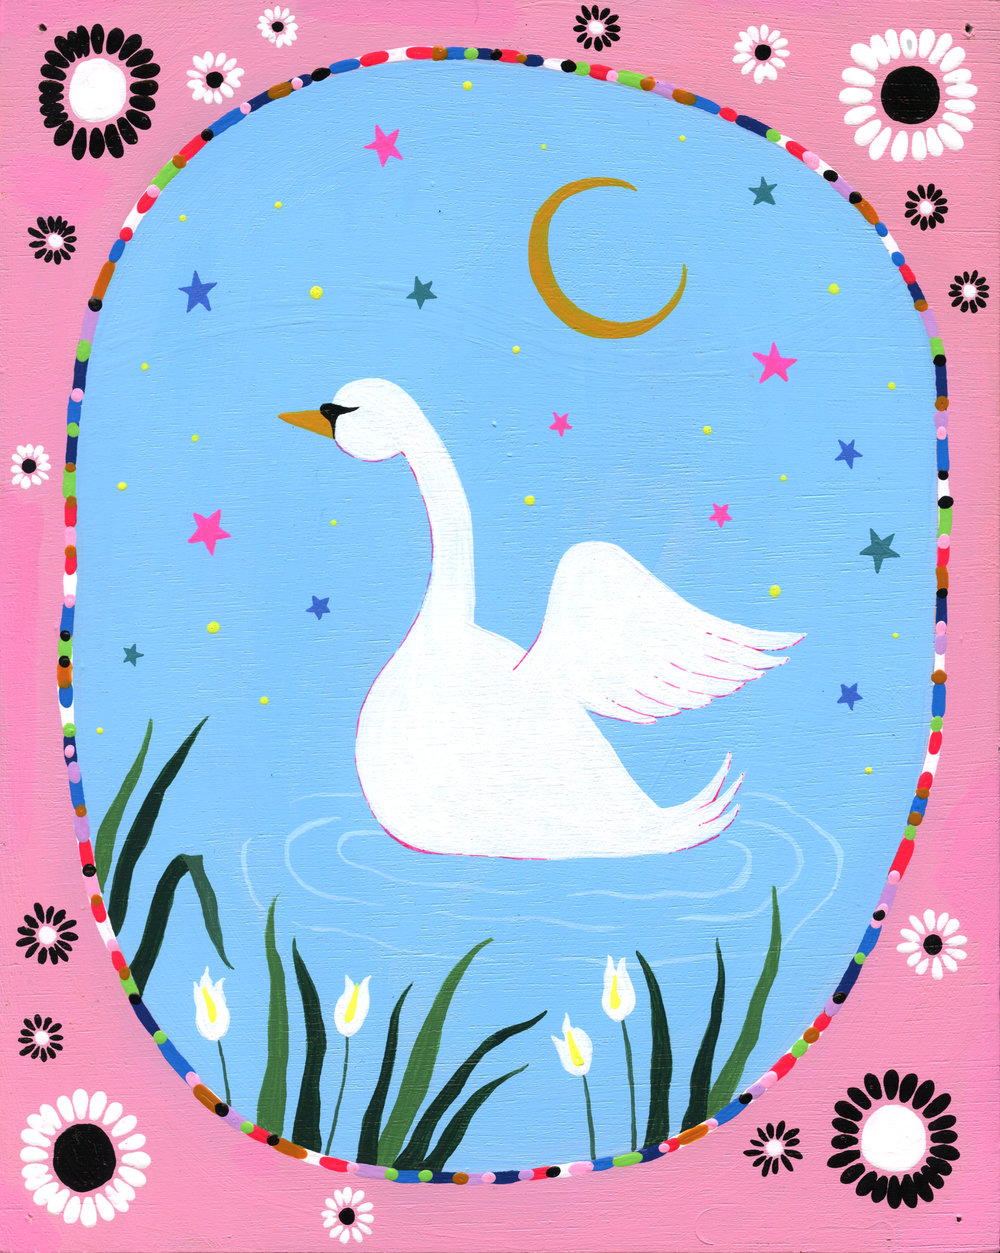 swan lake 1981